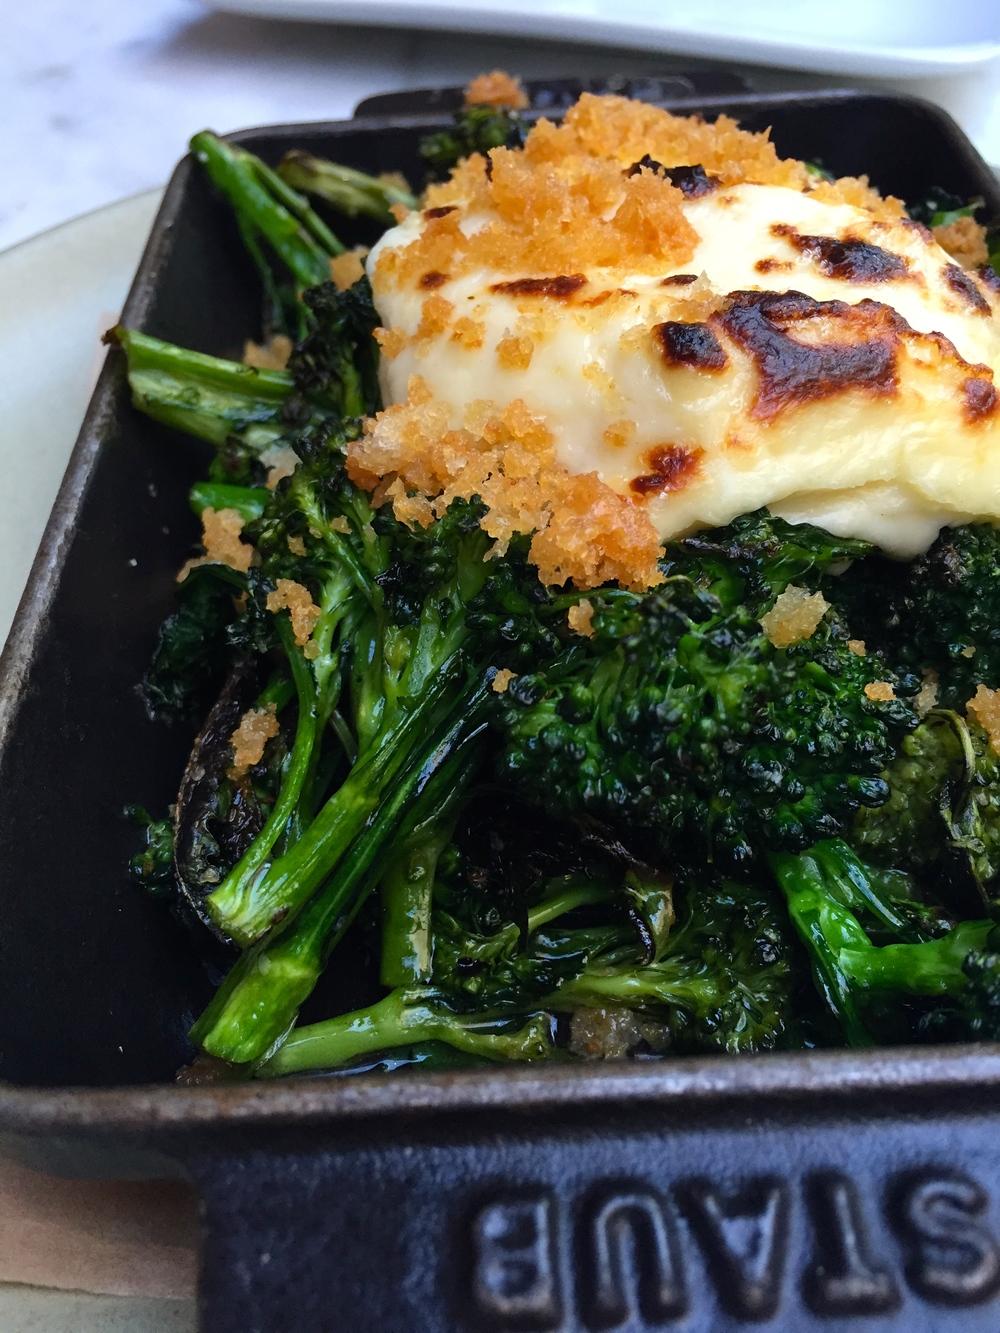 Baby broccoli parmesan pudding breadcrumb chili flake.